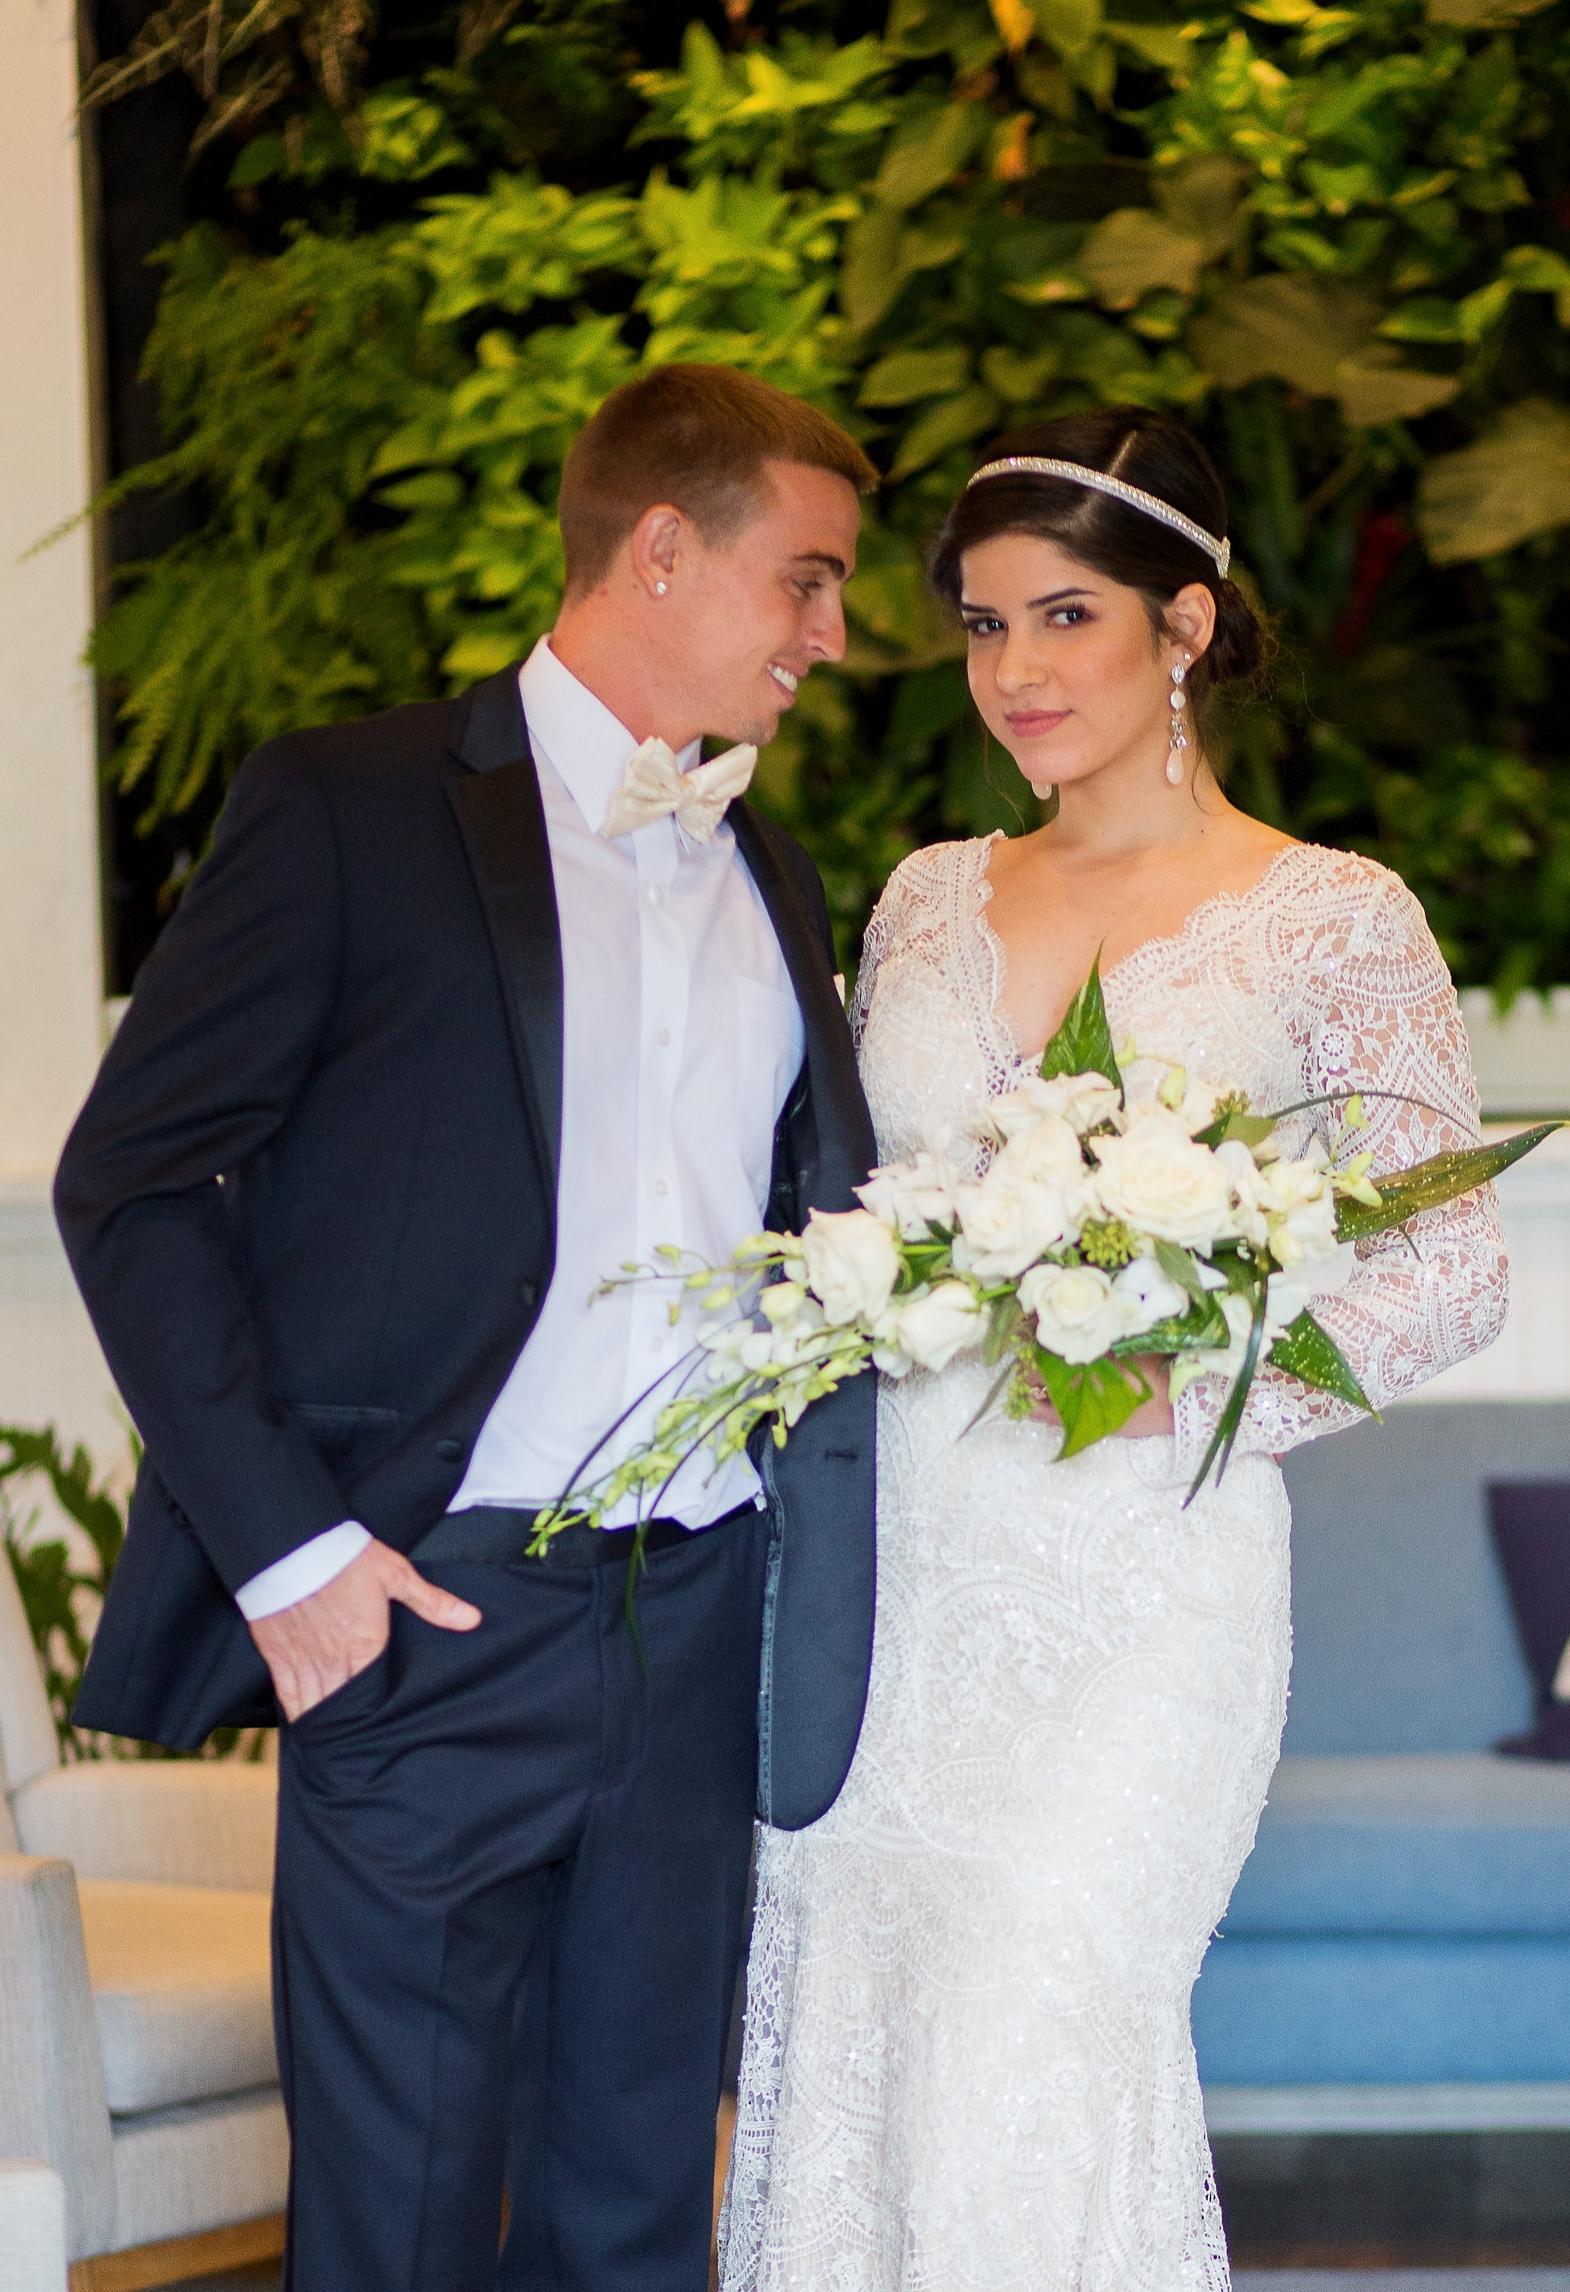 Bridal Halo, Boho bridal Headpiece, Forehead bridal Headband- Champagne and GRIT